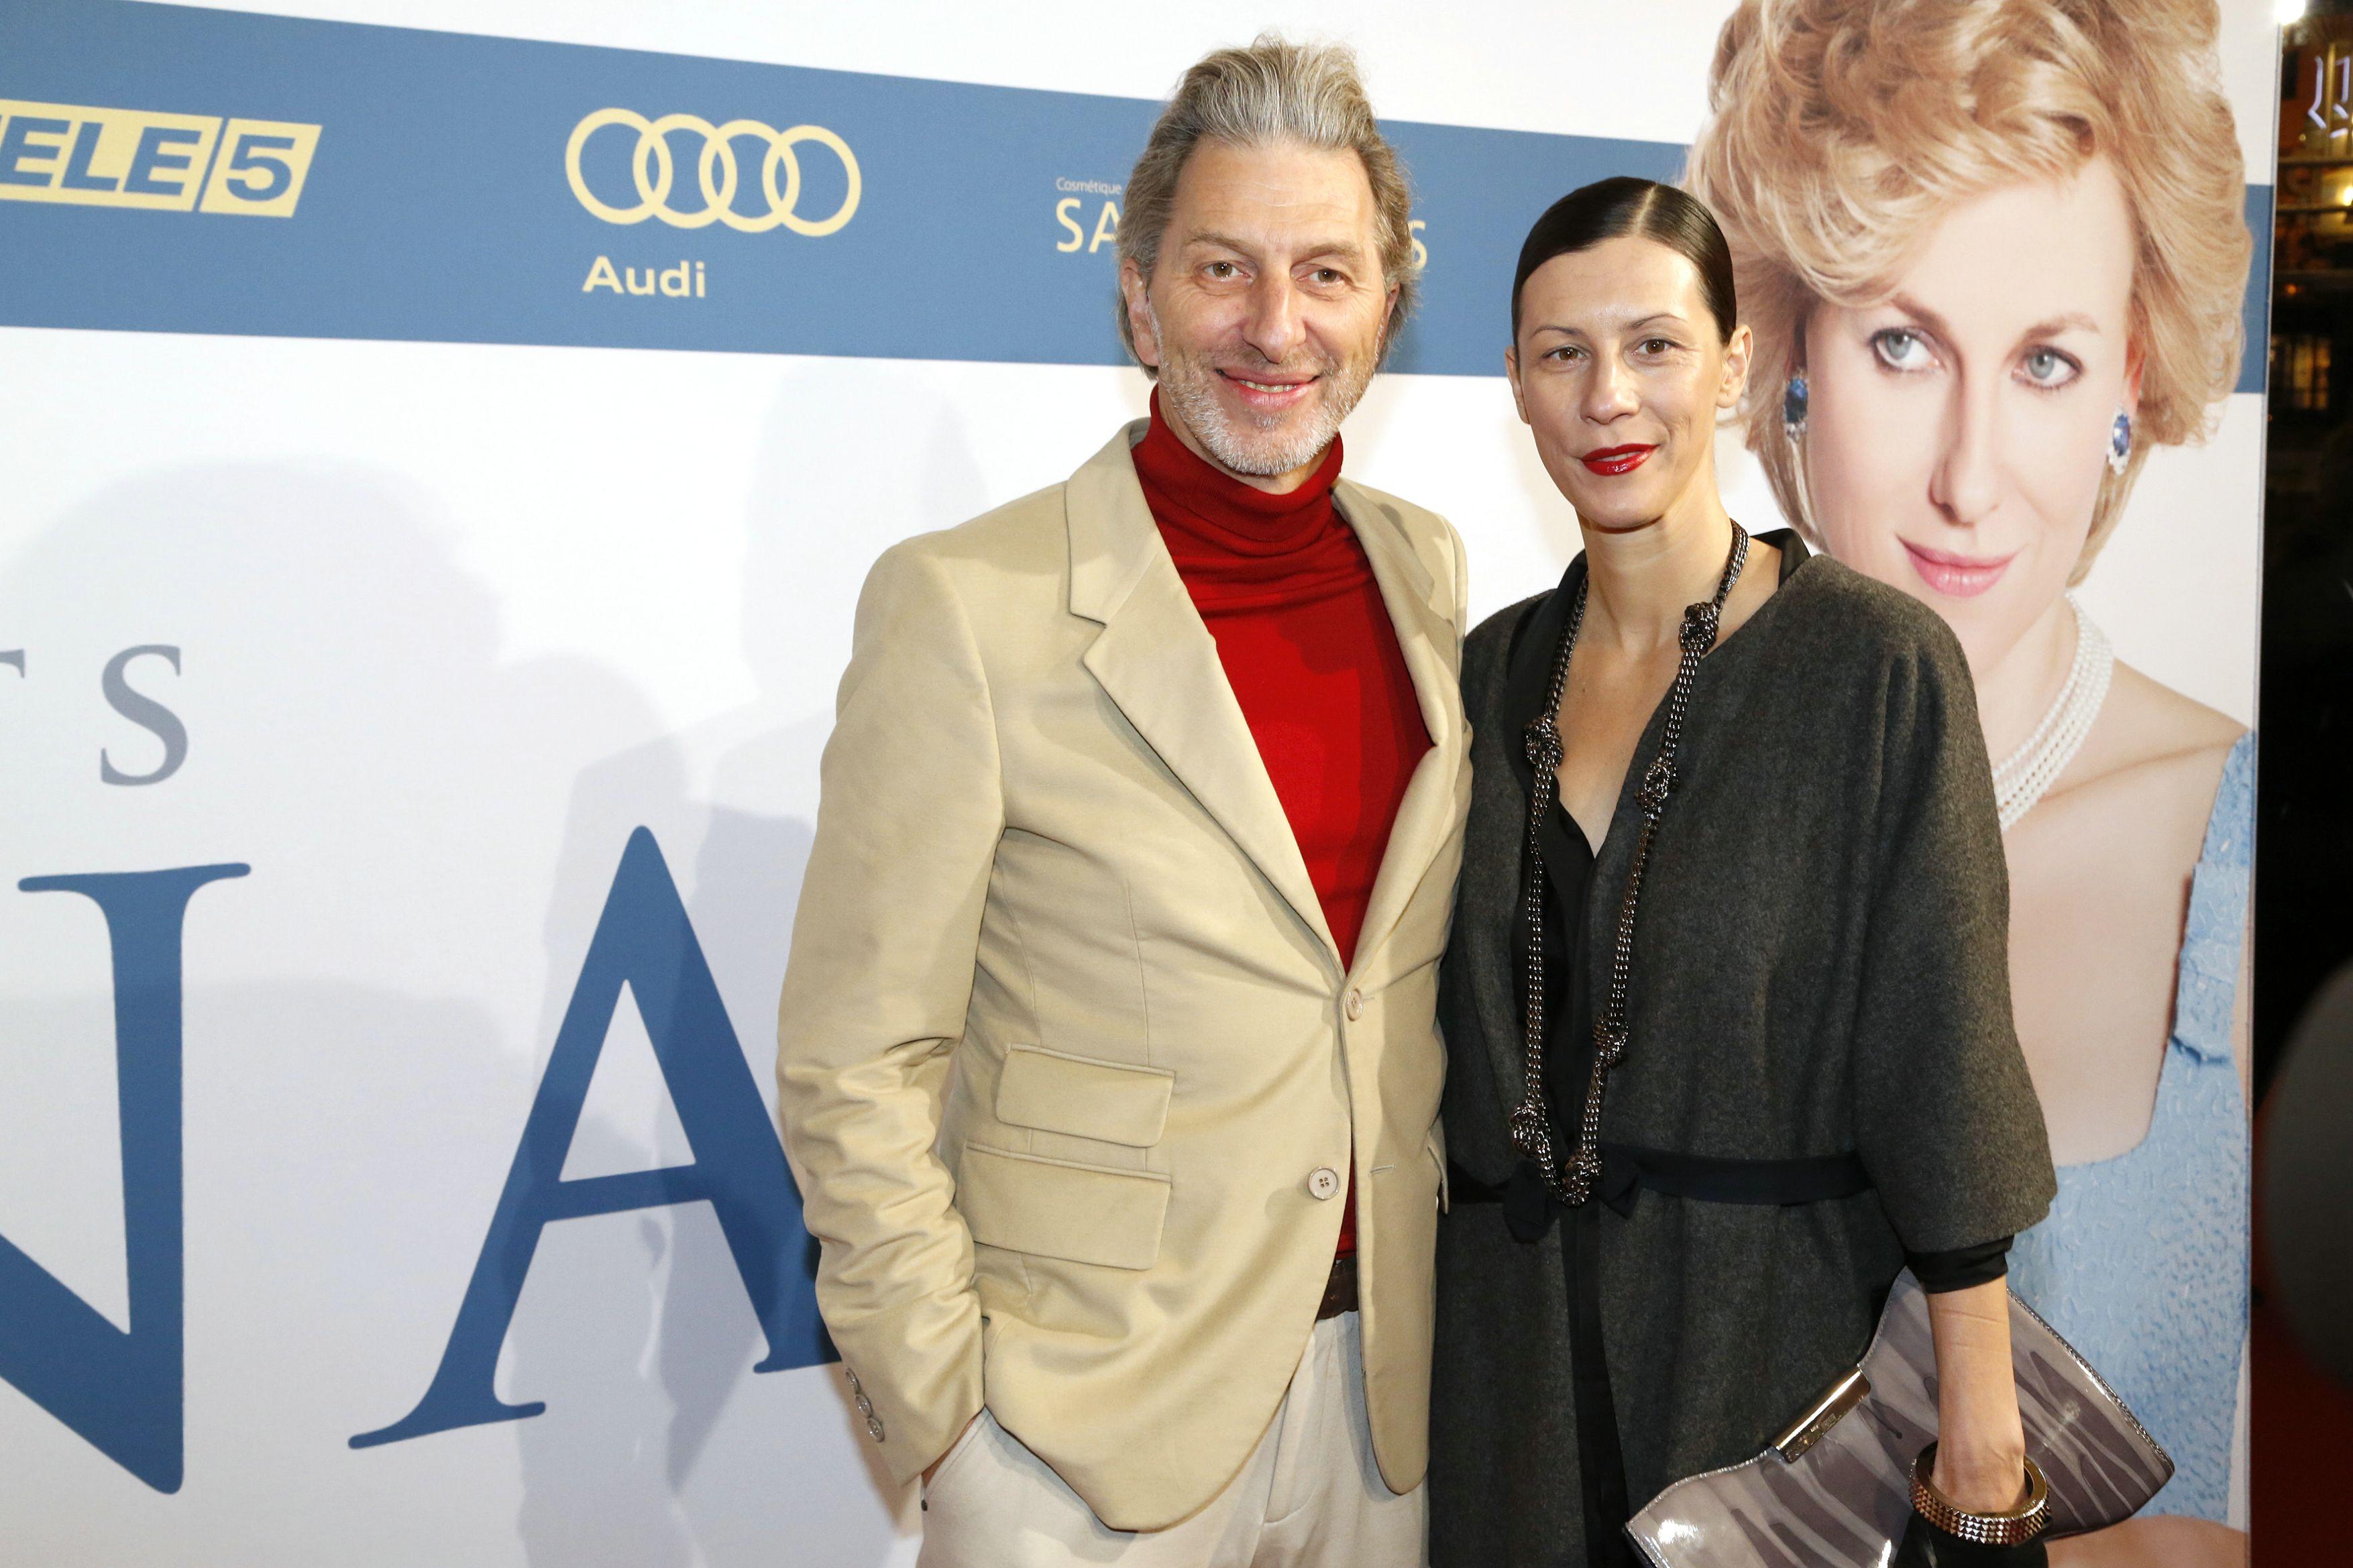 Diana [Premierenbilder] Rufus Beck und Andrea Kameniczky-Teleky © 2013  Concorde Filmverleih GmbH